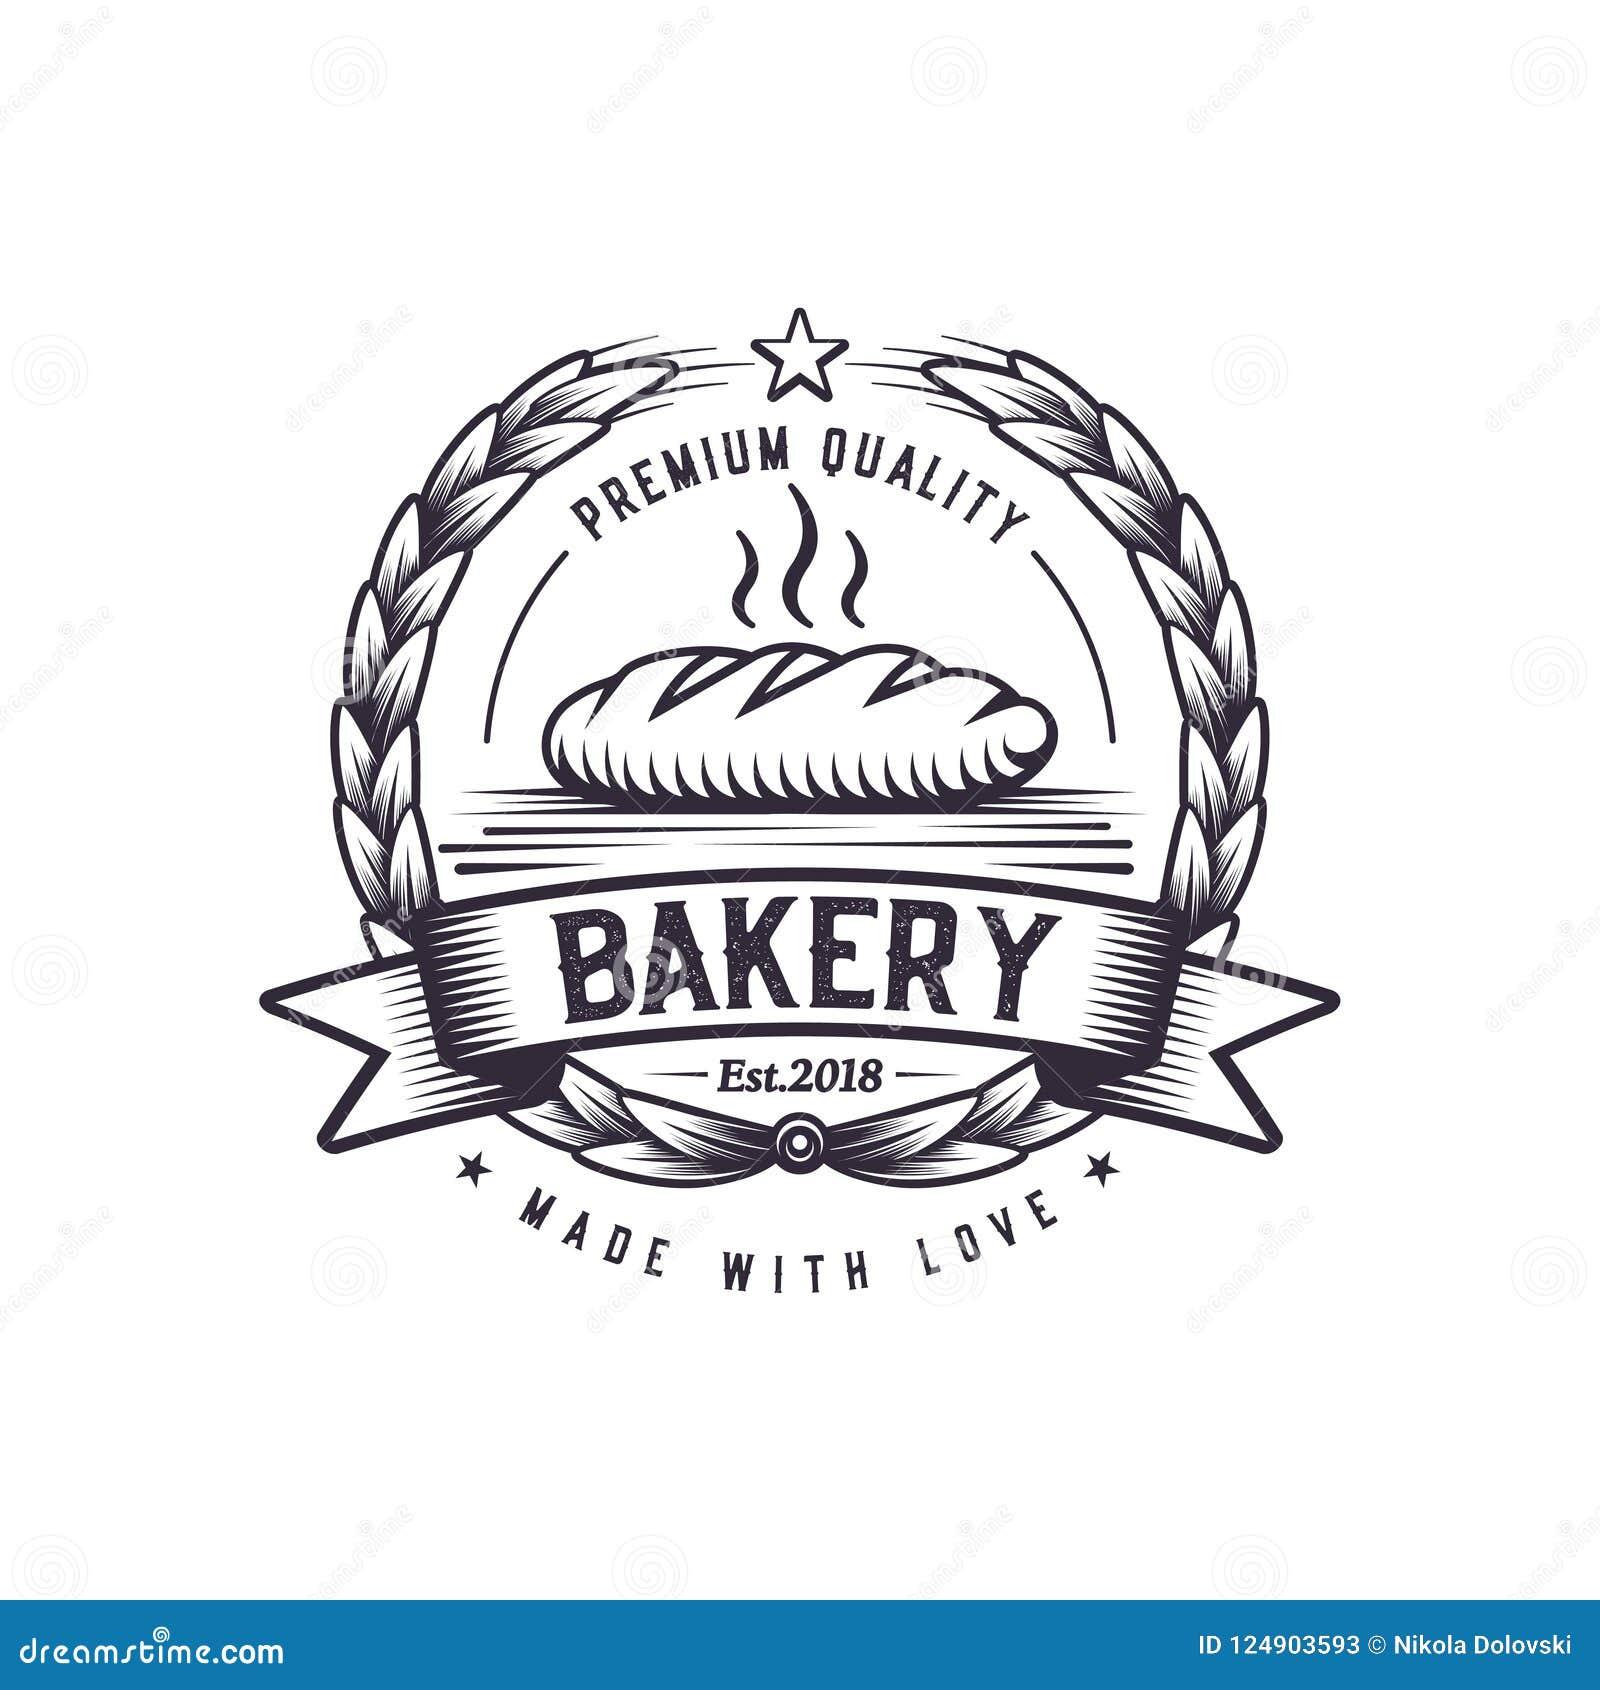 Vintage Wheat Logo Collection: Bakery Logo With Ribbon Vintage Design Vector Illustration